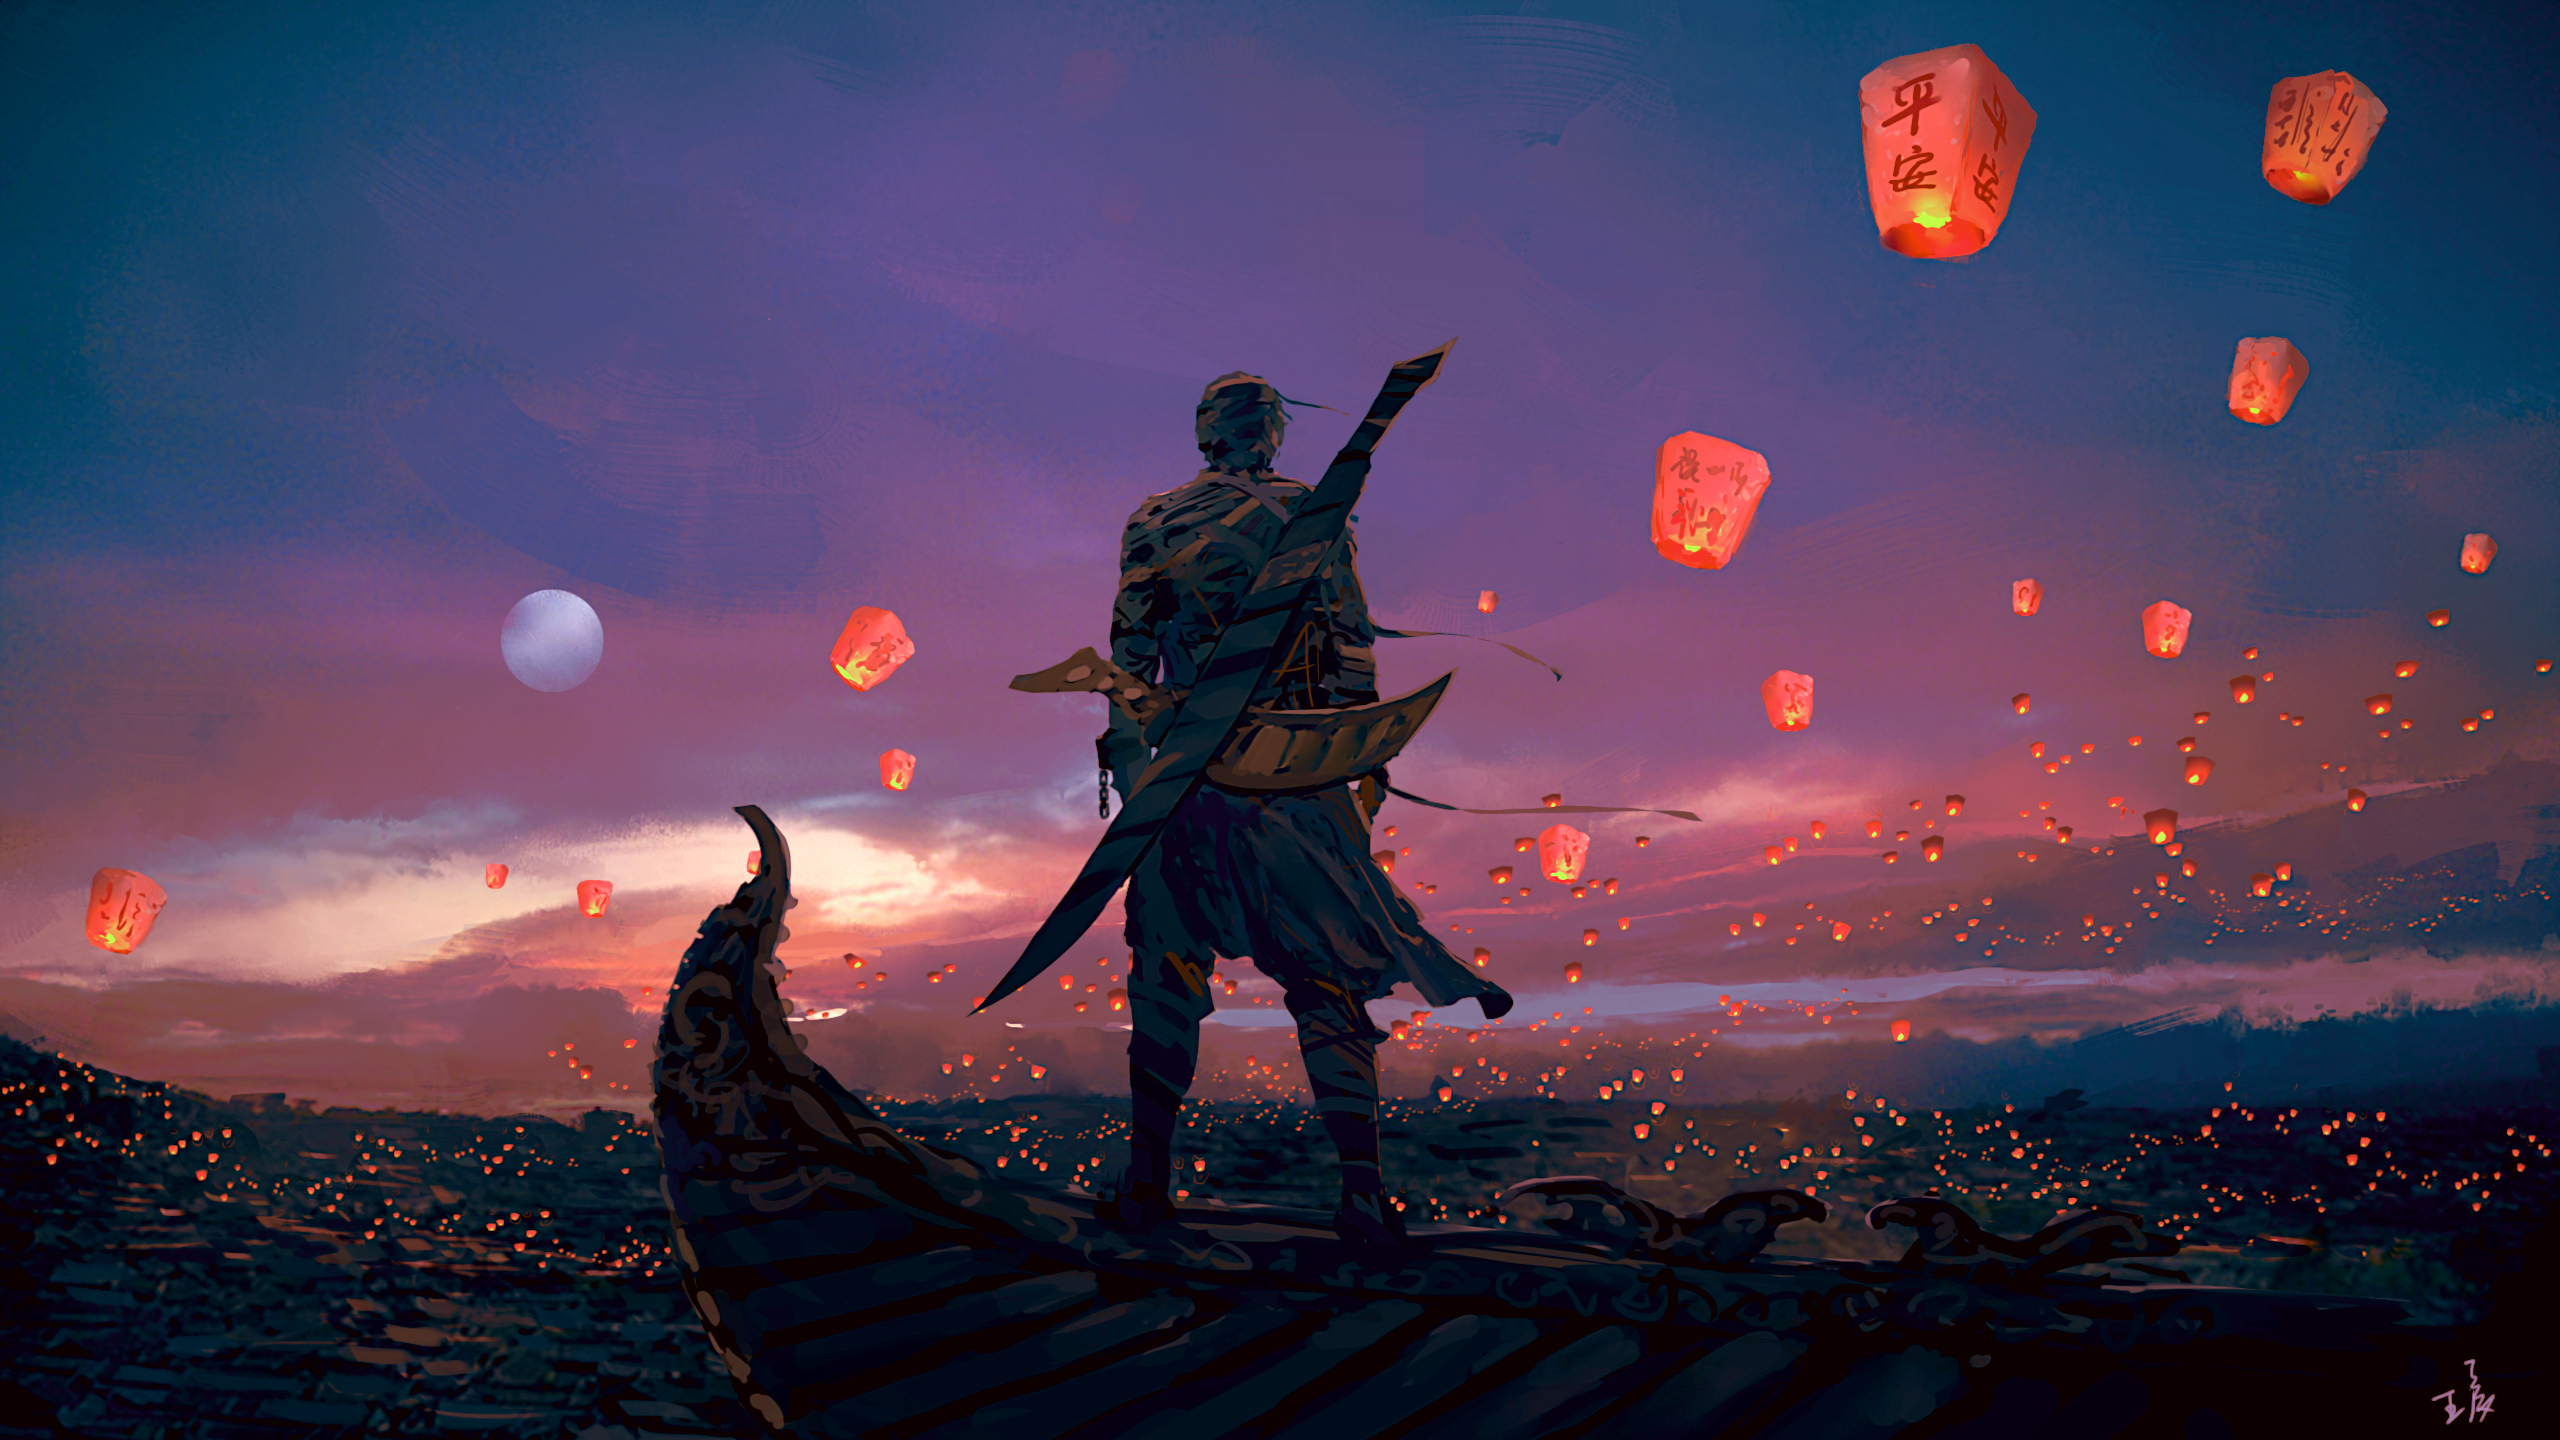 samuraimummy.jpg